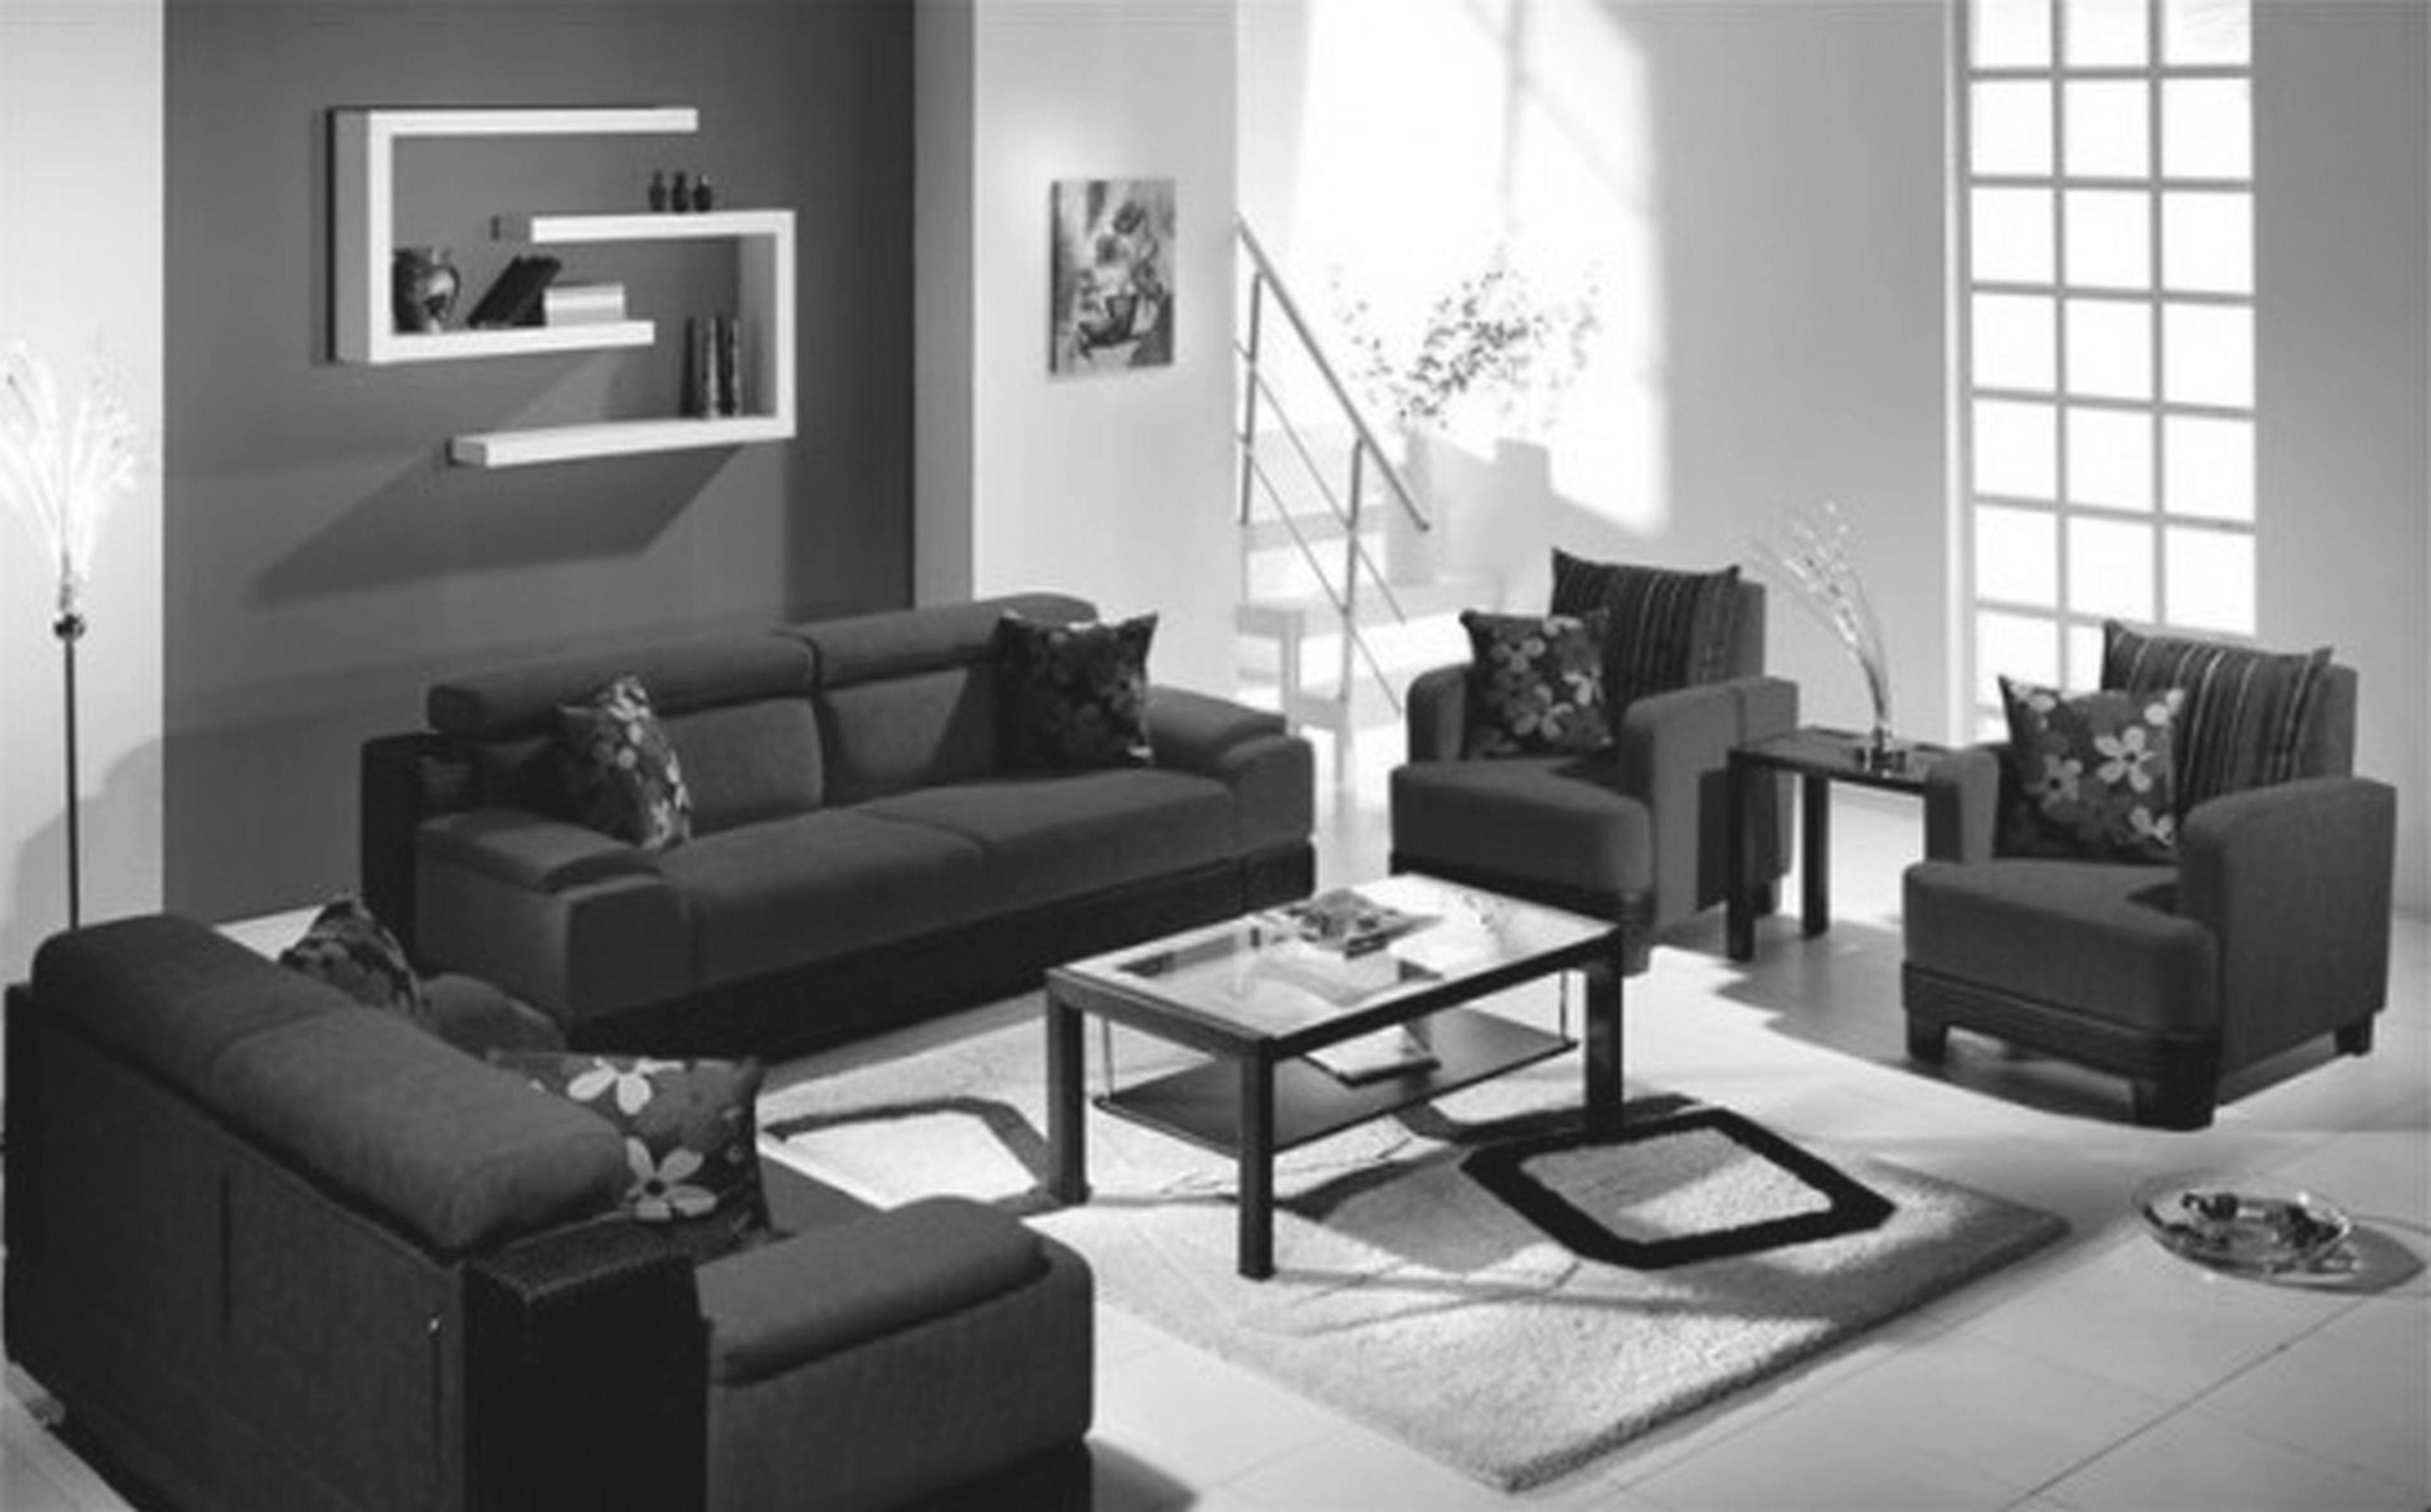 Interior Design Living Room Ideas Uk For Pretty Contemporary Throughout Black Living Room Decor Awesome Decors